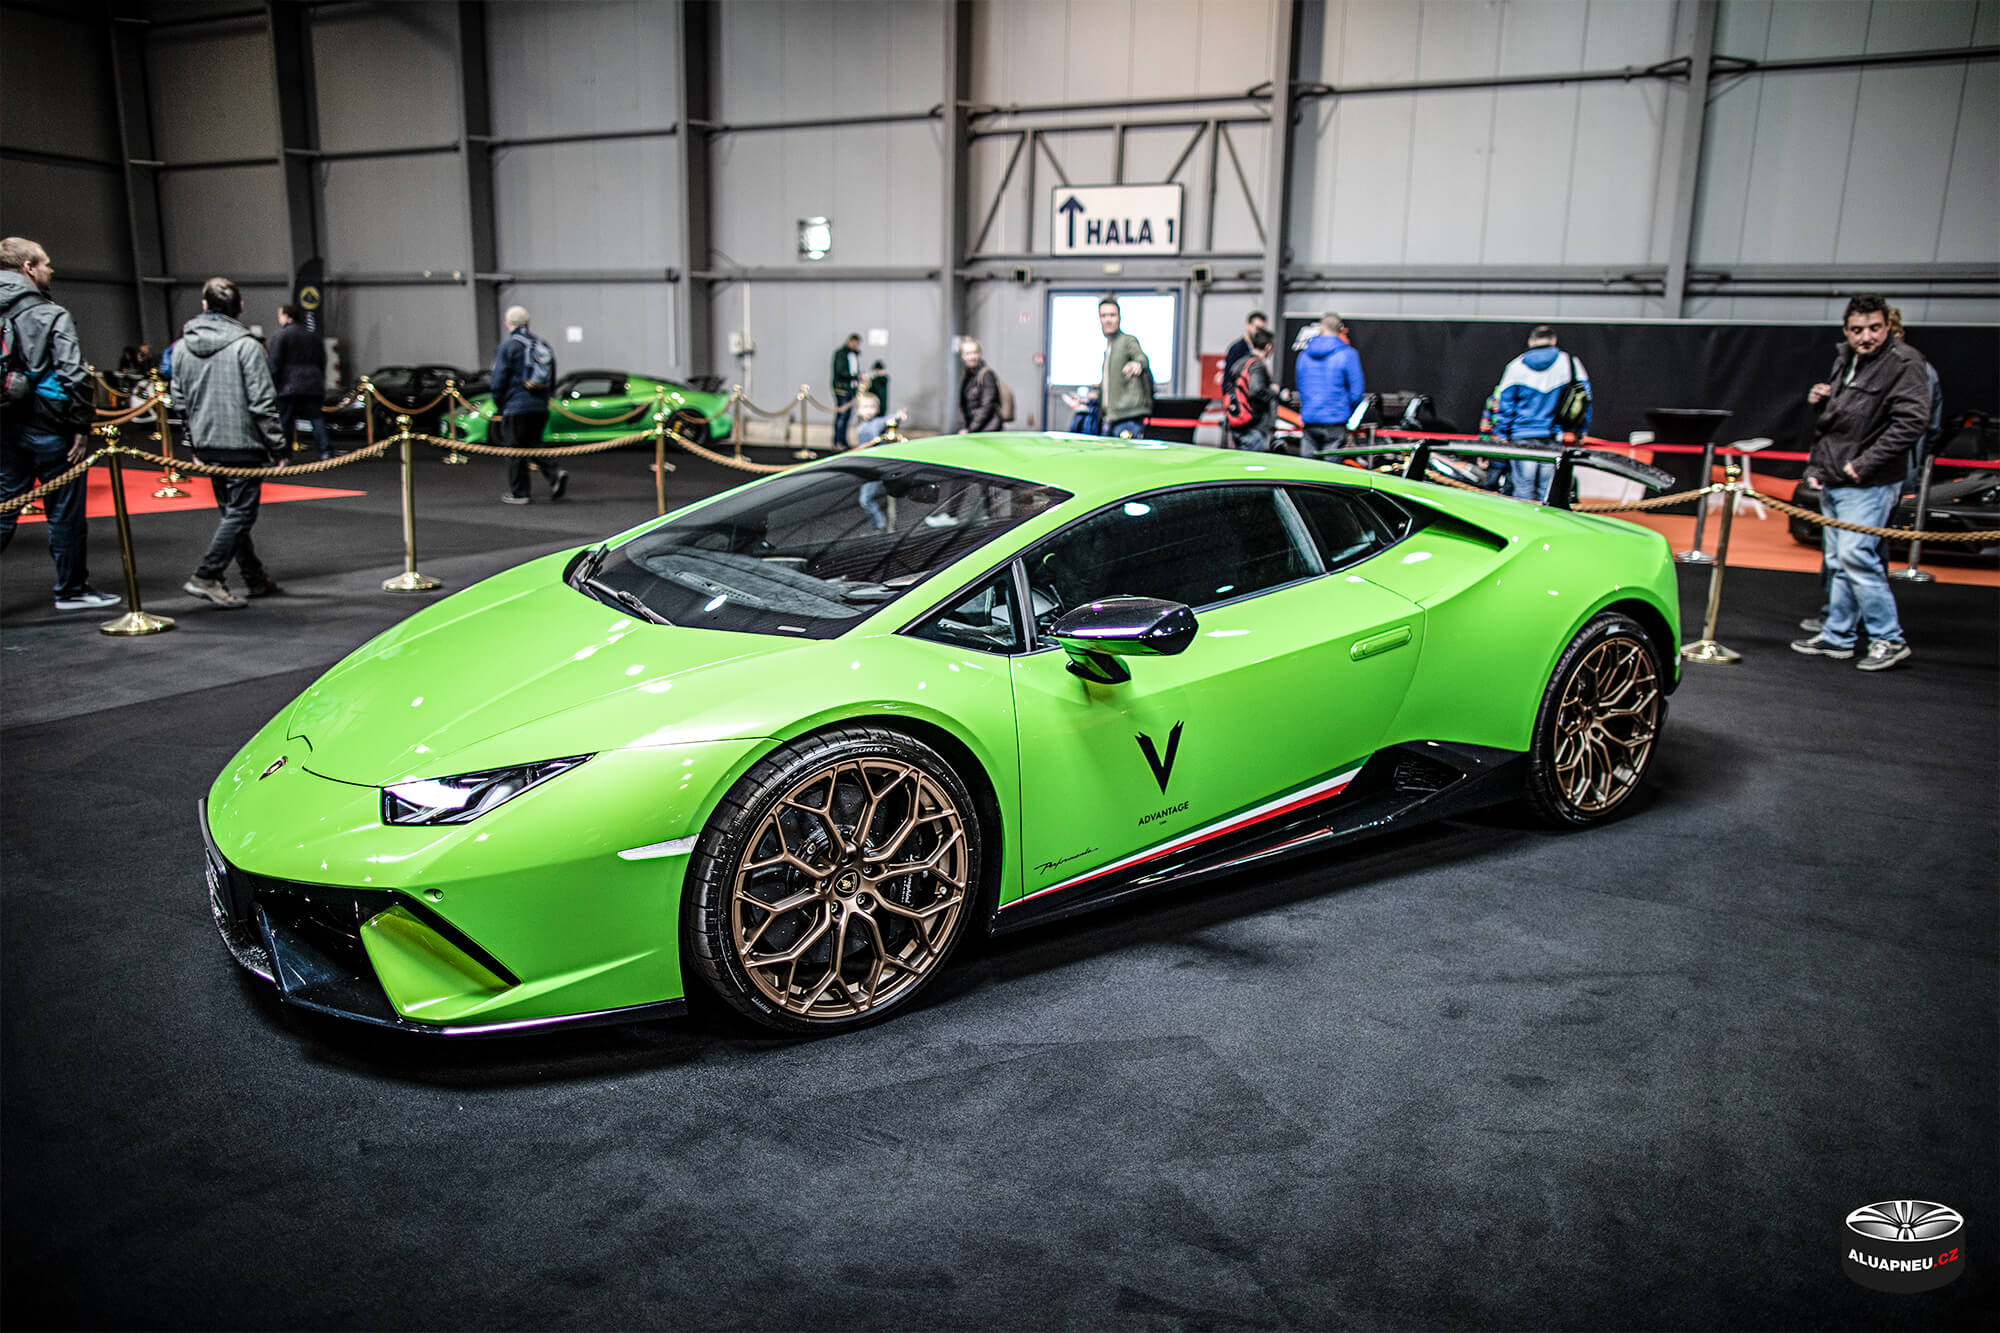 Zelené Lamborghini Aventador - bronzová alu kola - Autosalon Praha 2019 - www.aluapneu.cz